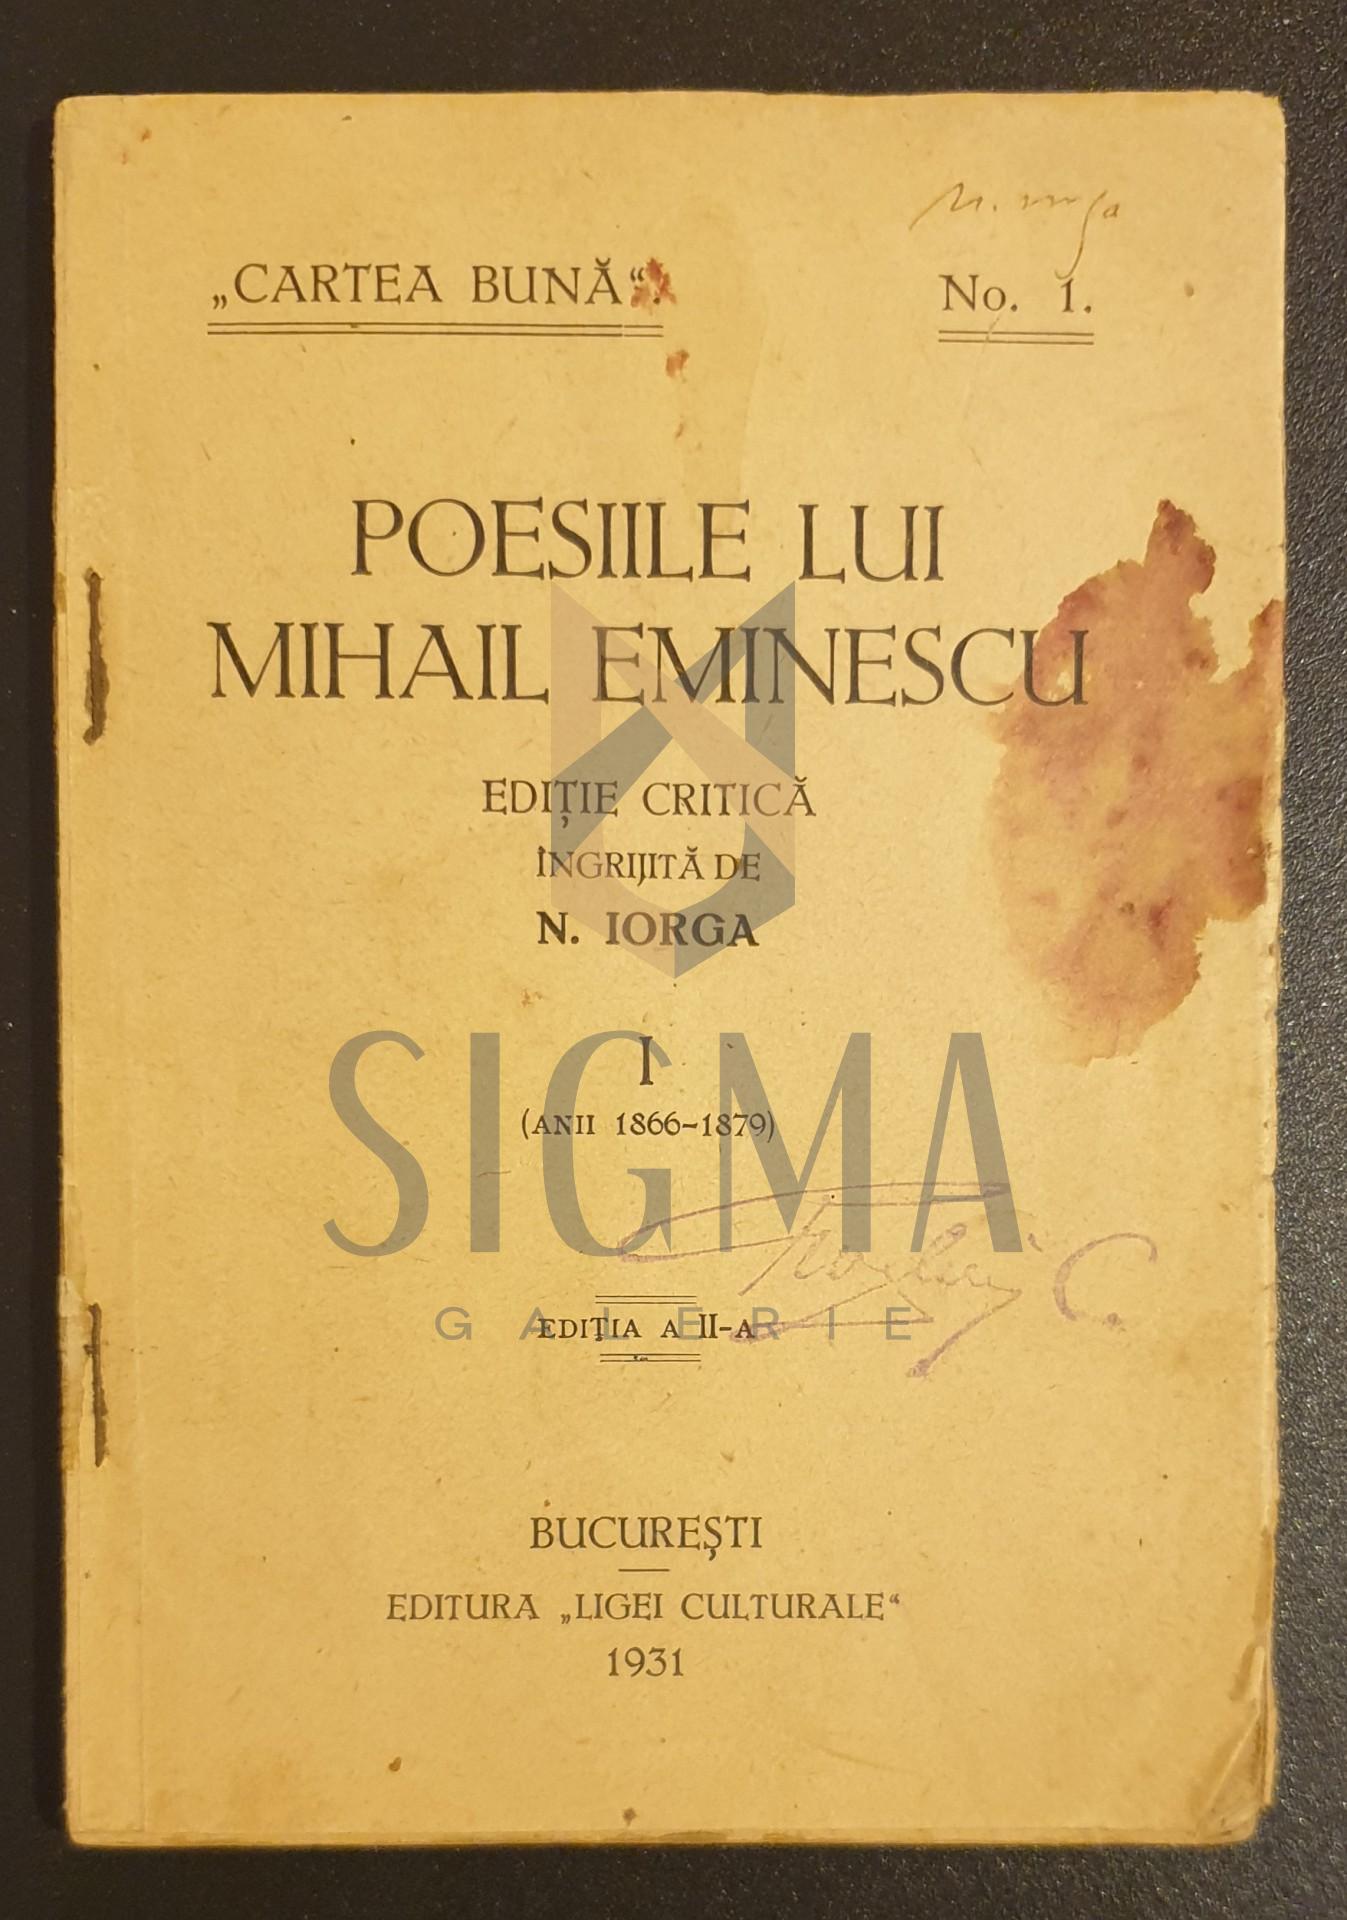 Poesiile lui Mihail Eminescu, vol 1